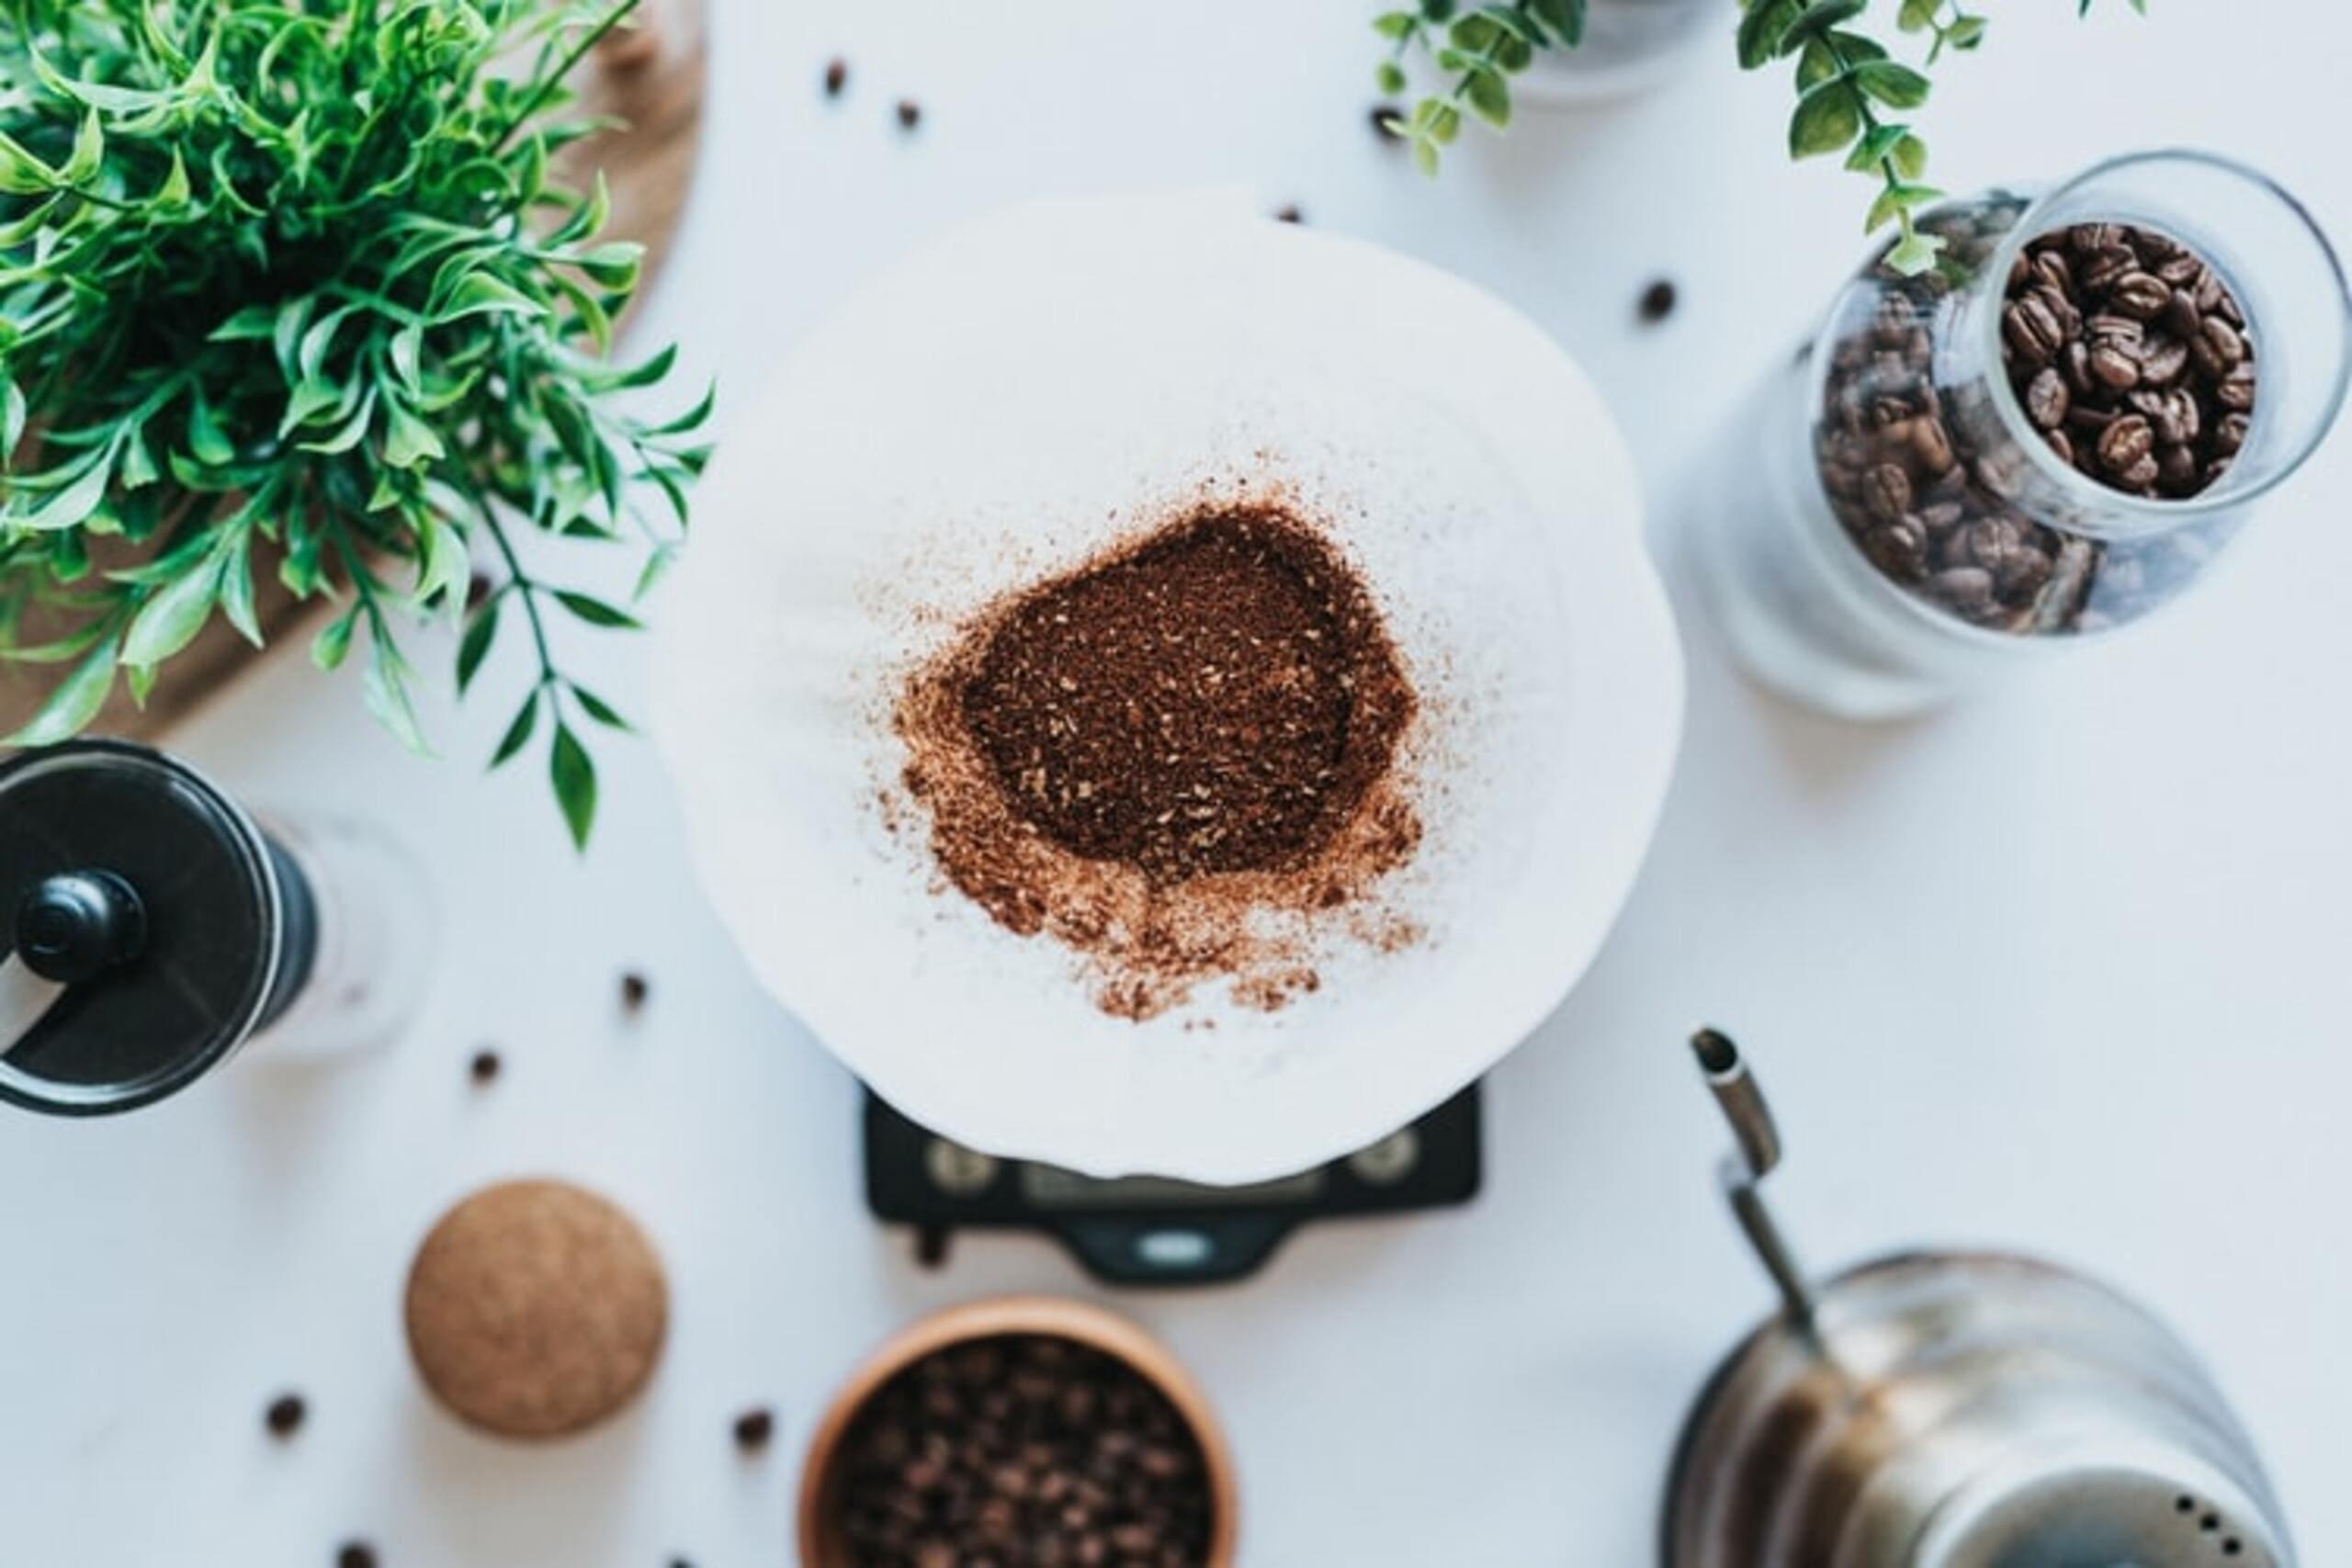 Méo sac grains café